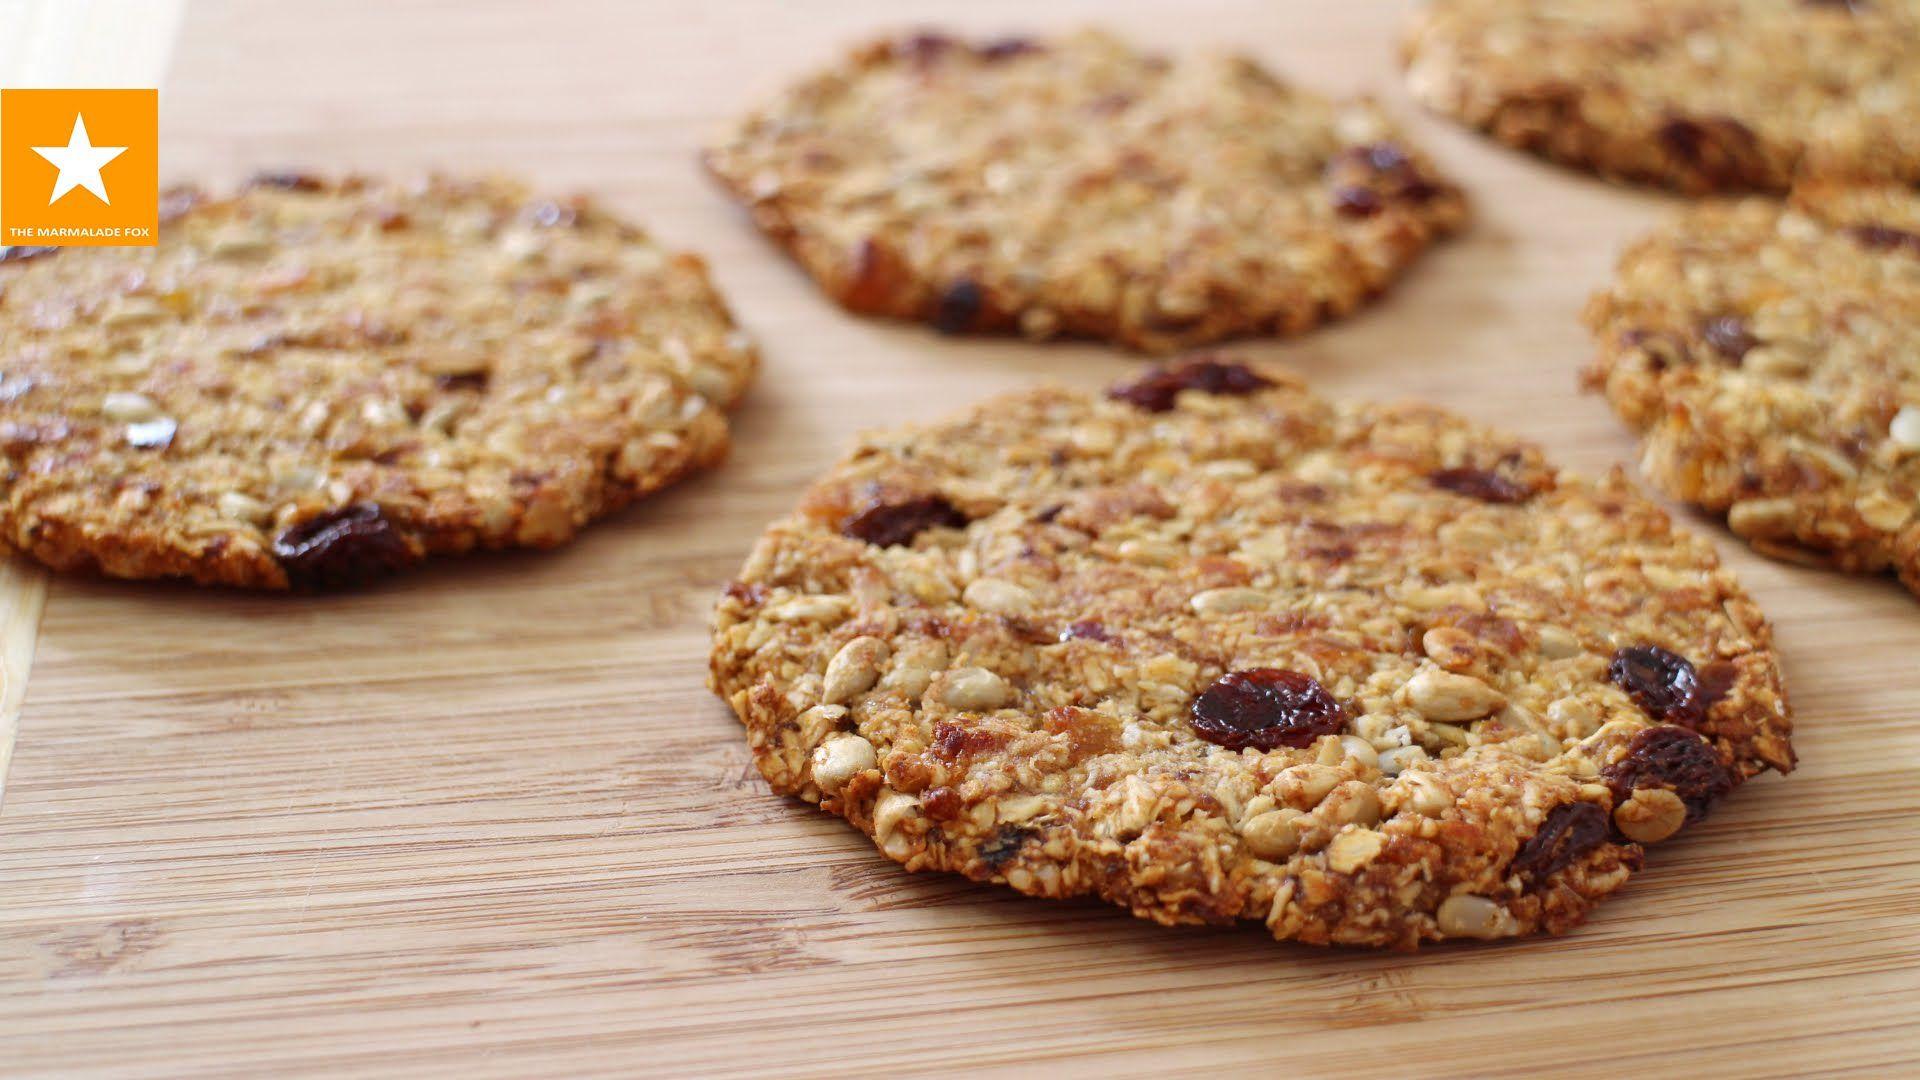 recipe sweet bake idea delicious forchildren cookies healthy healthyandtasty oatmealcookies banana heathylifestyle oatflakes healthysnack